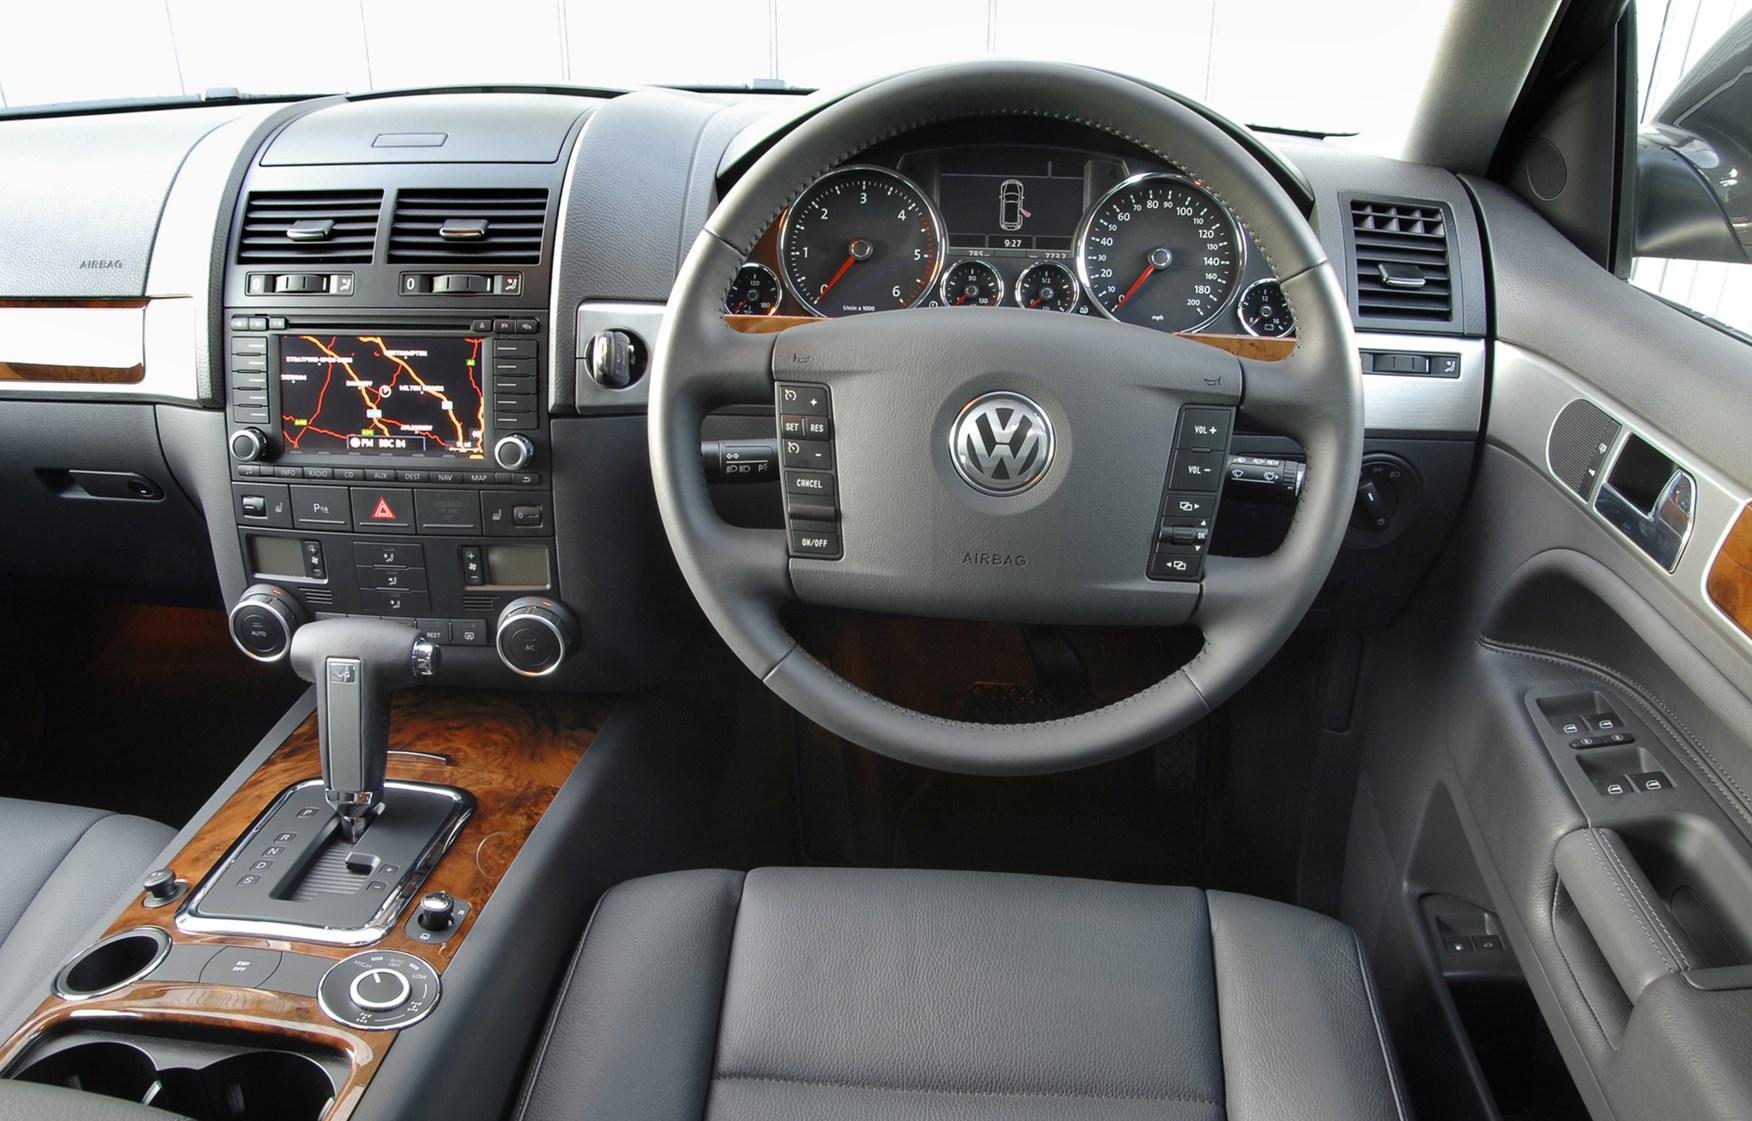 Volkswagen touareg estate review 2003 2009 parkers fandeluxe Images